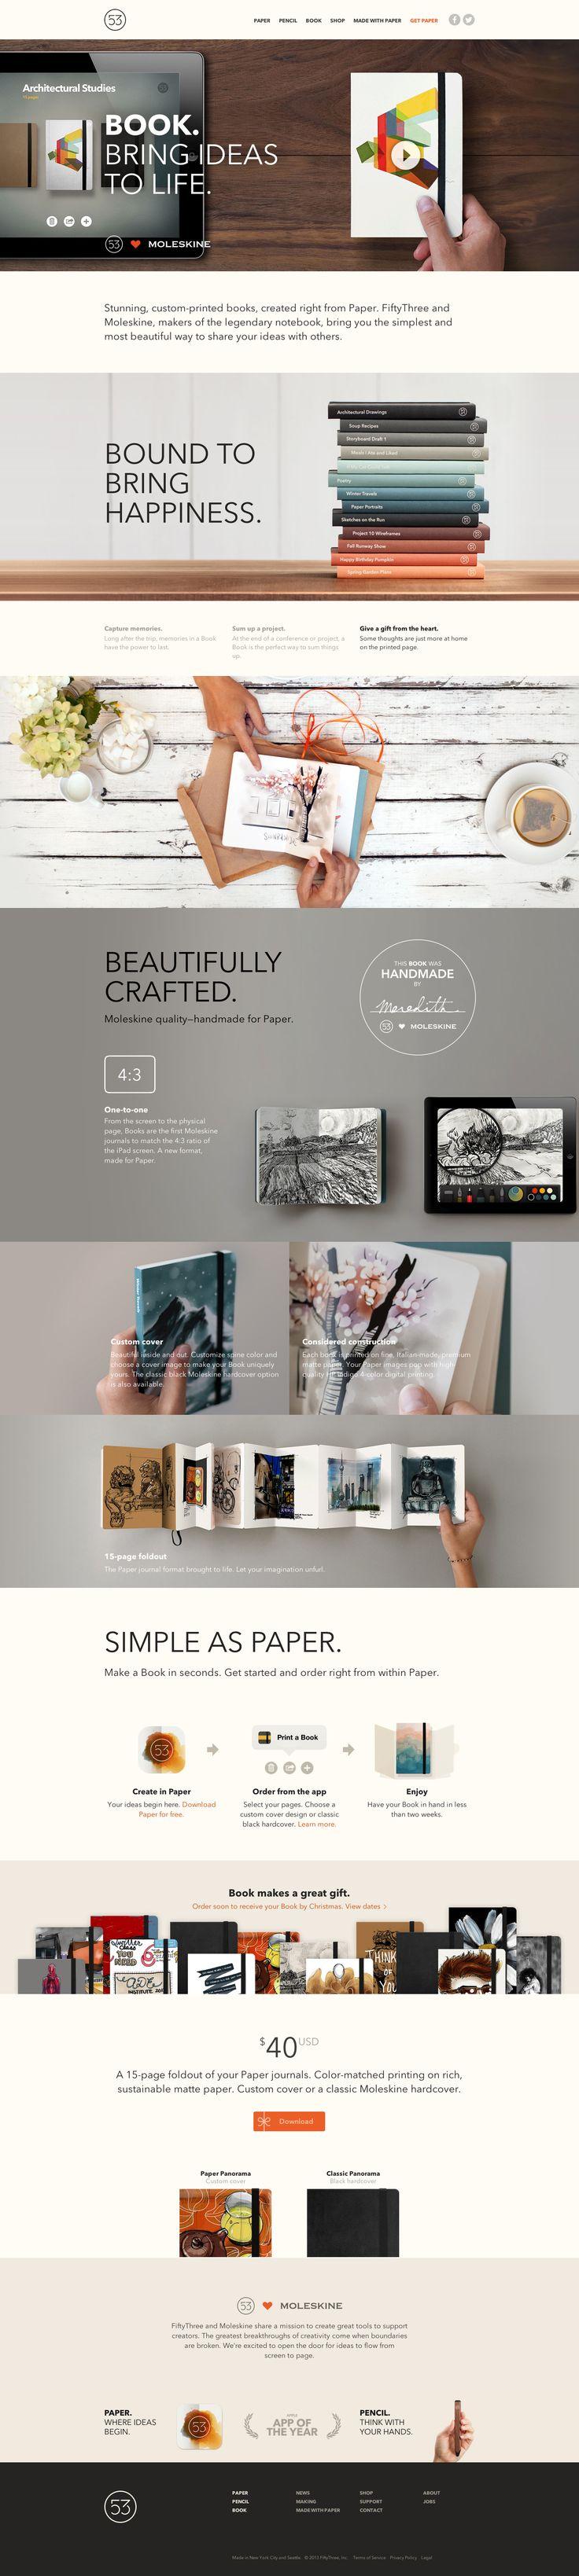 53 page design